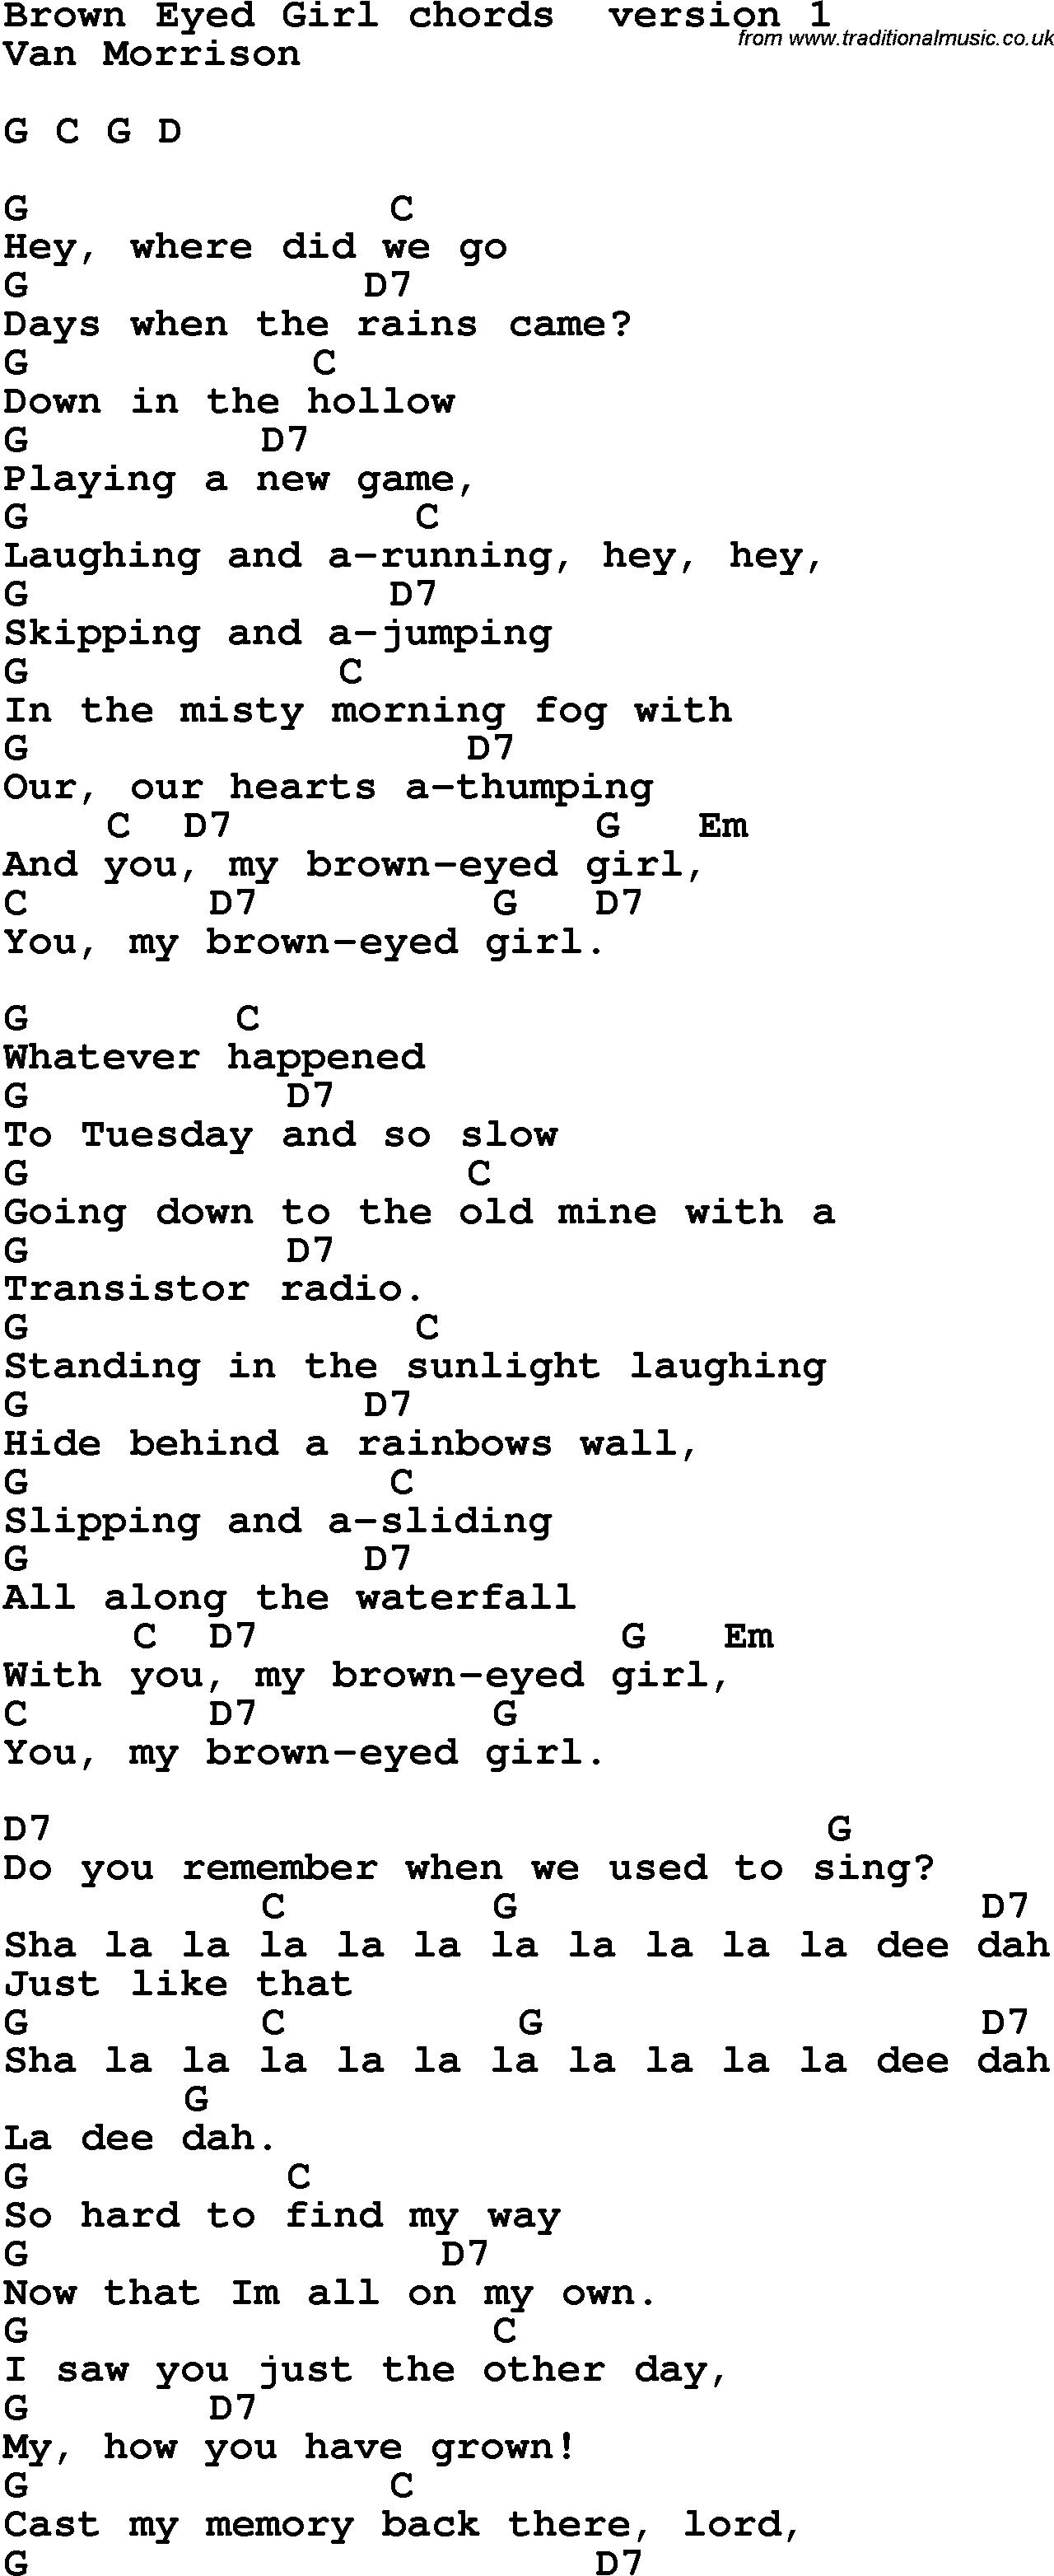 Brown Eyed Girl Chords Song Lyrics With Guitar Chords For Brown Eyed Girl